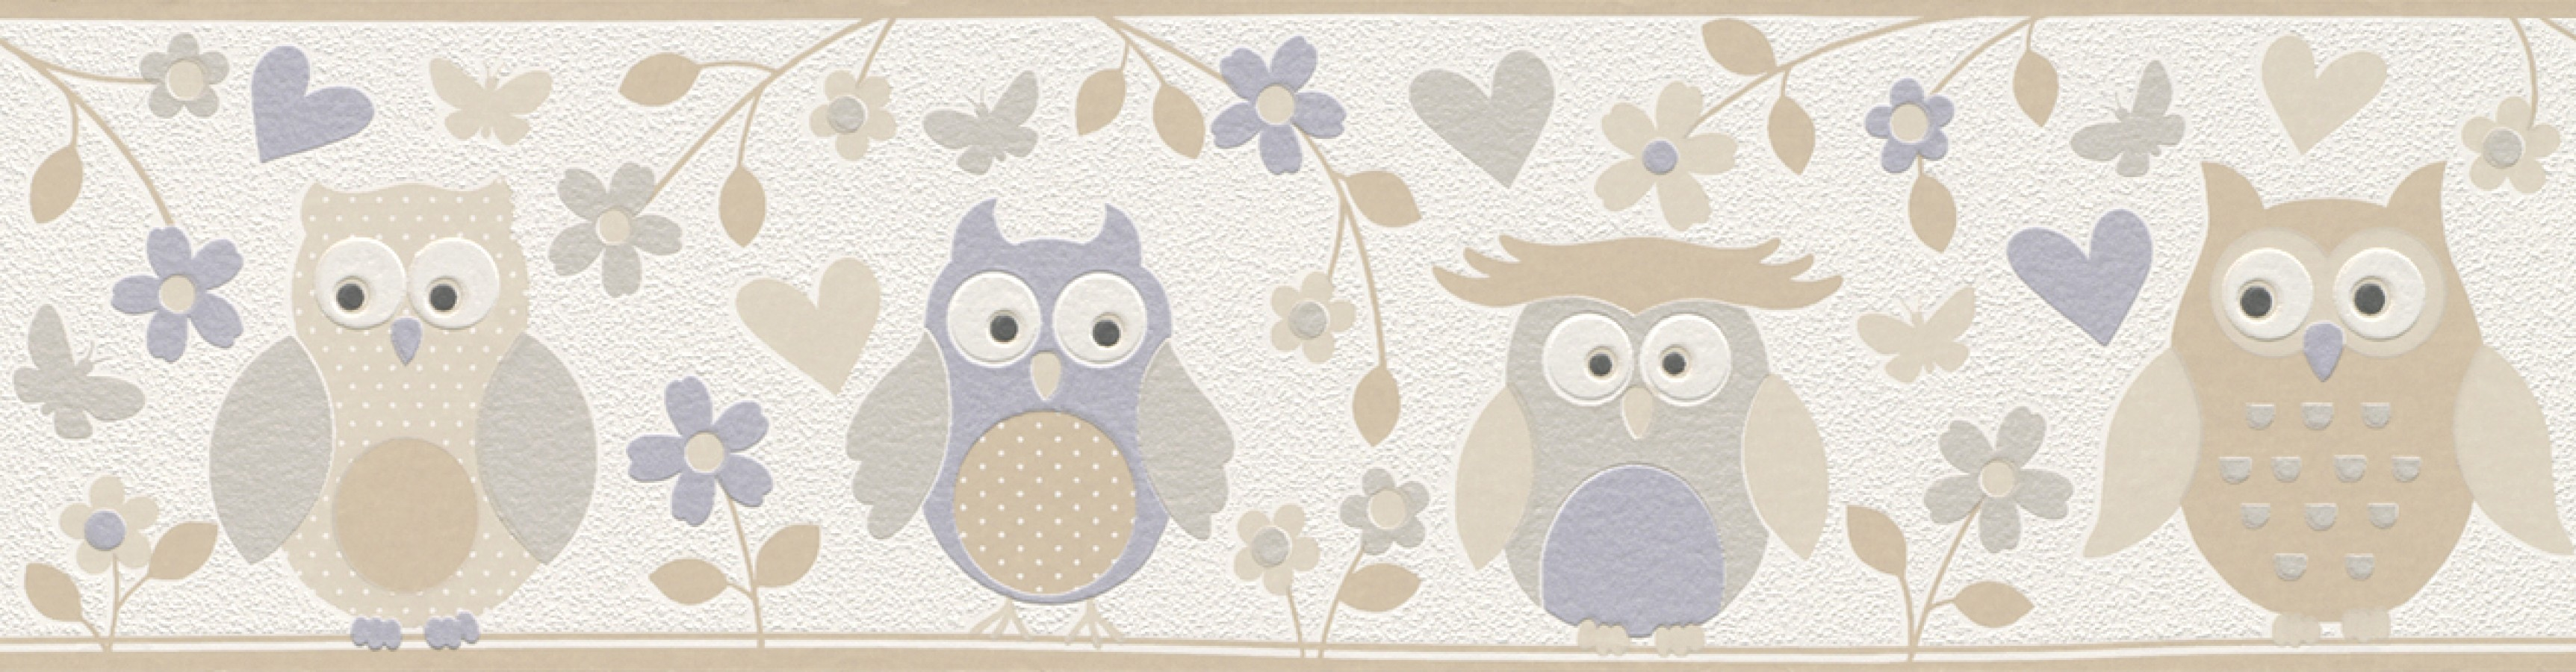 Cenefa búhos y flores infantiles beige oscuro Sweet Owls 6299